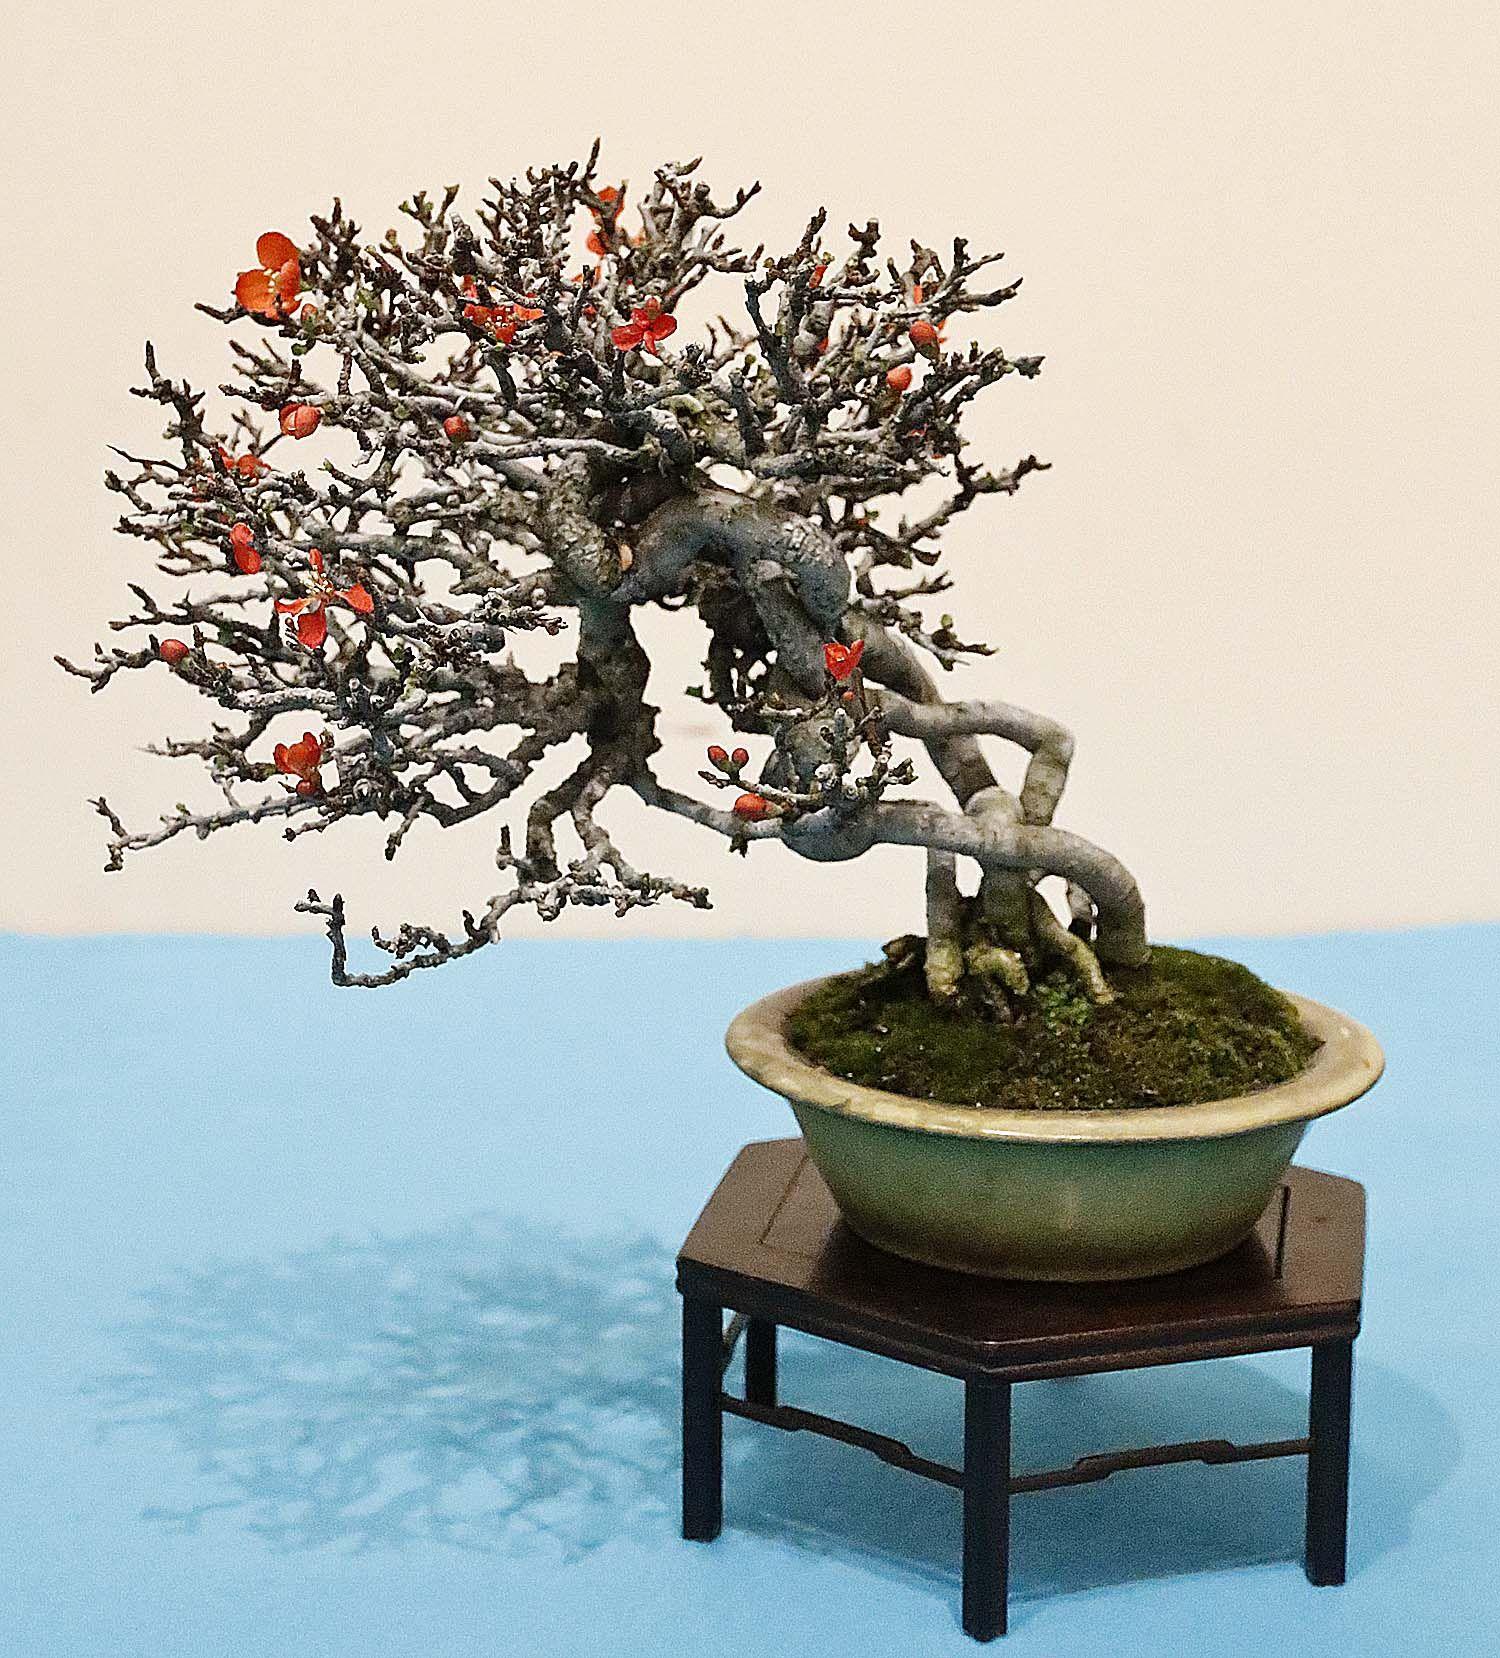 Chojubai Japanese Flowering Quince Chaenomeles Japonica Chojubai Bonsai Bonsai Flower Black Pine Bonsai